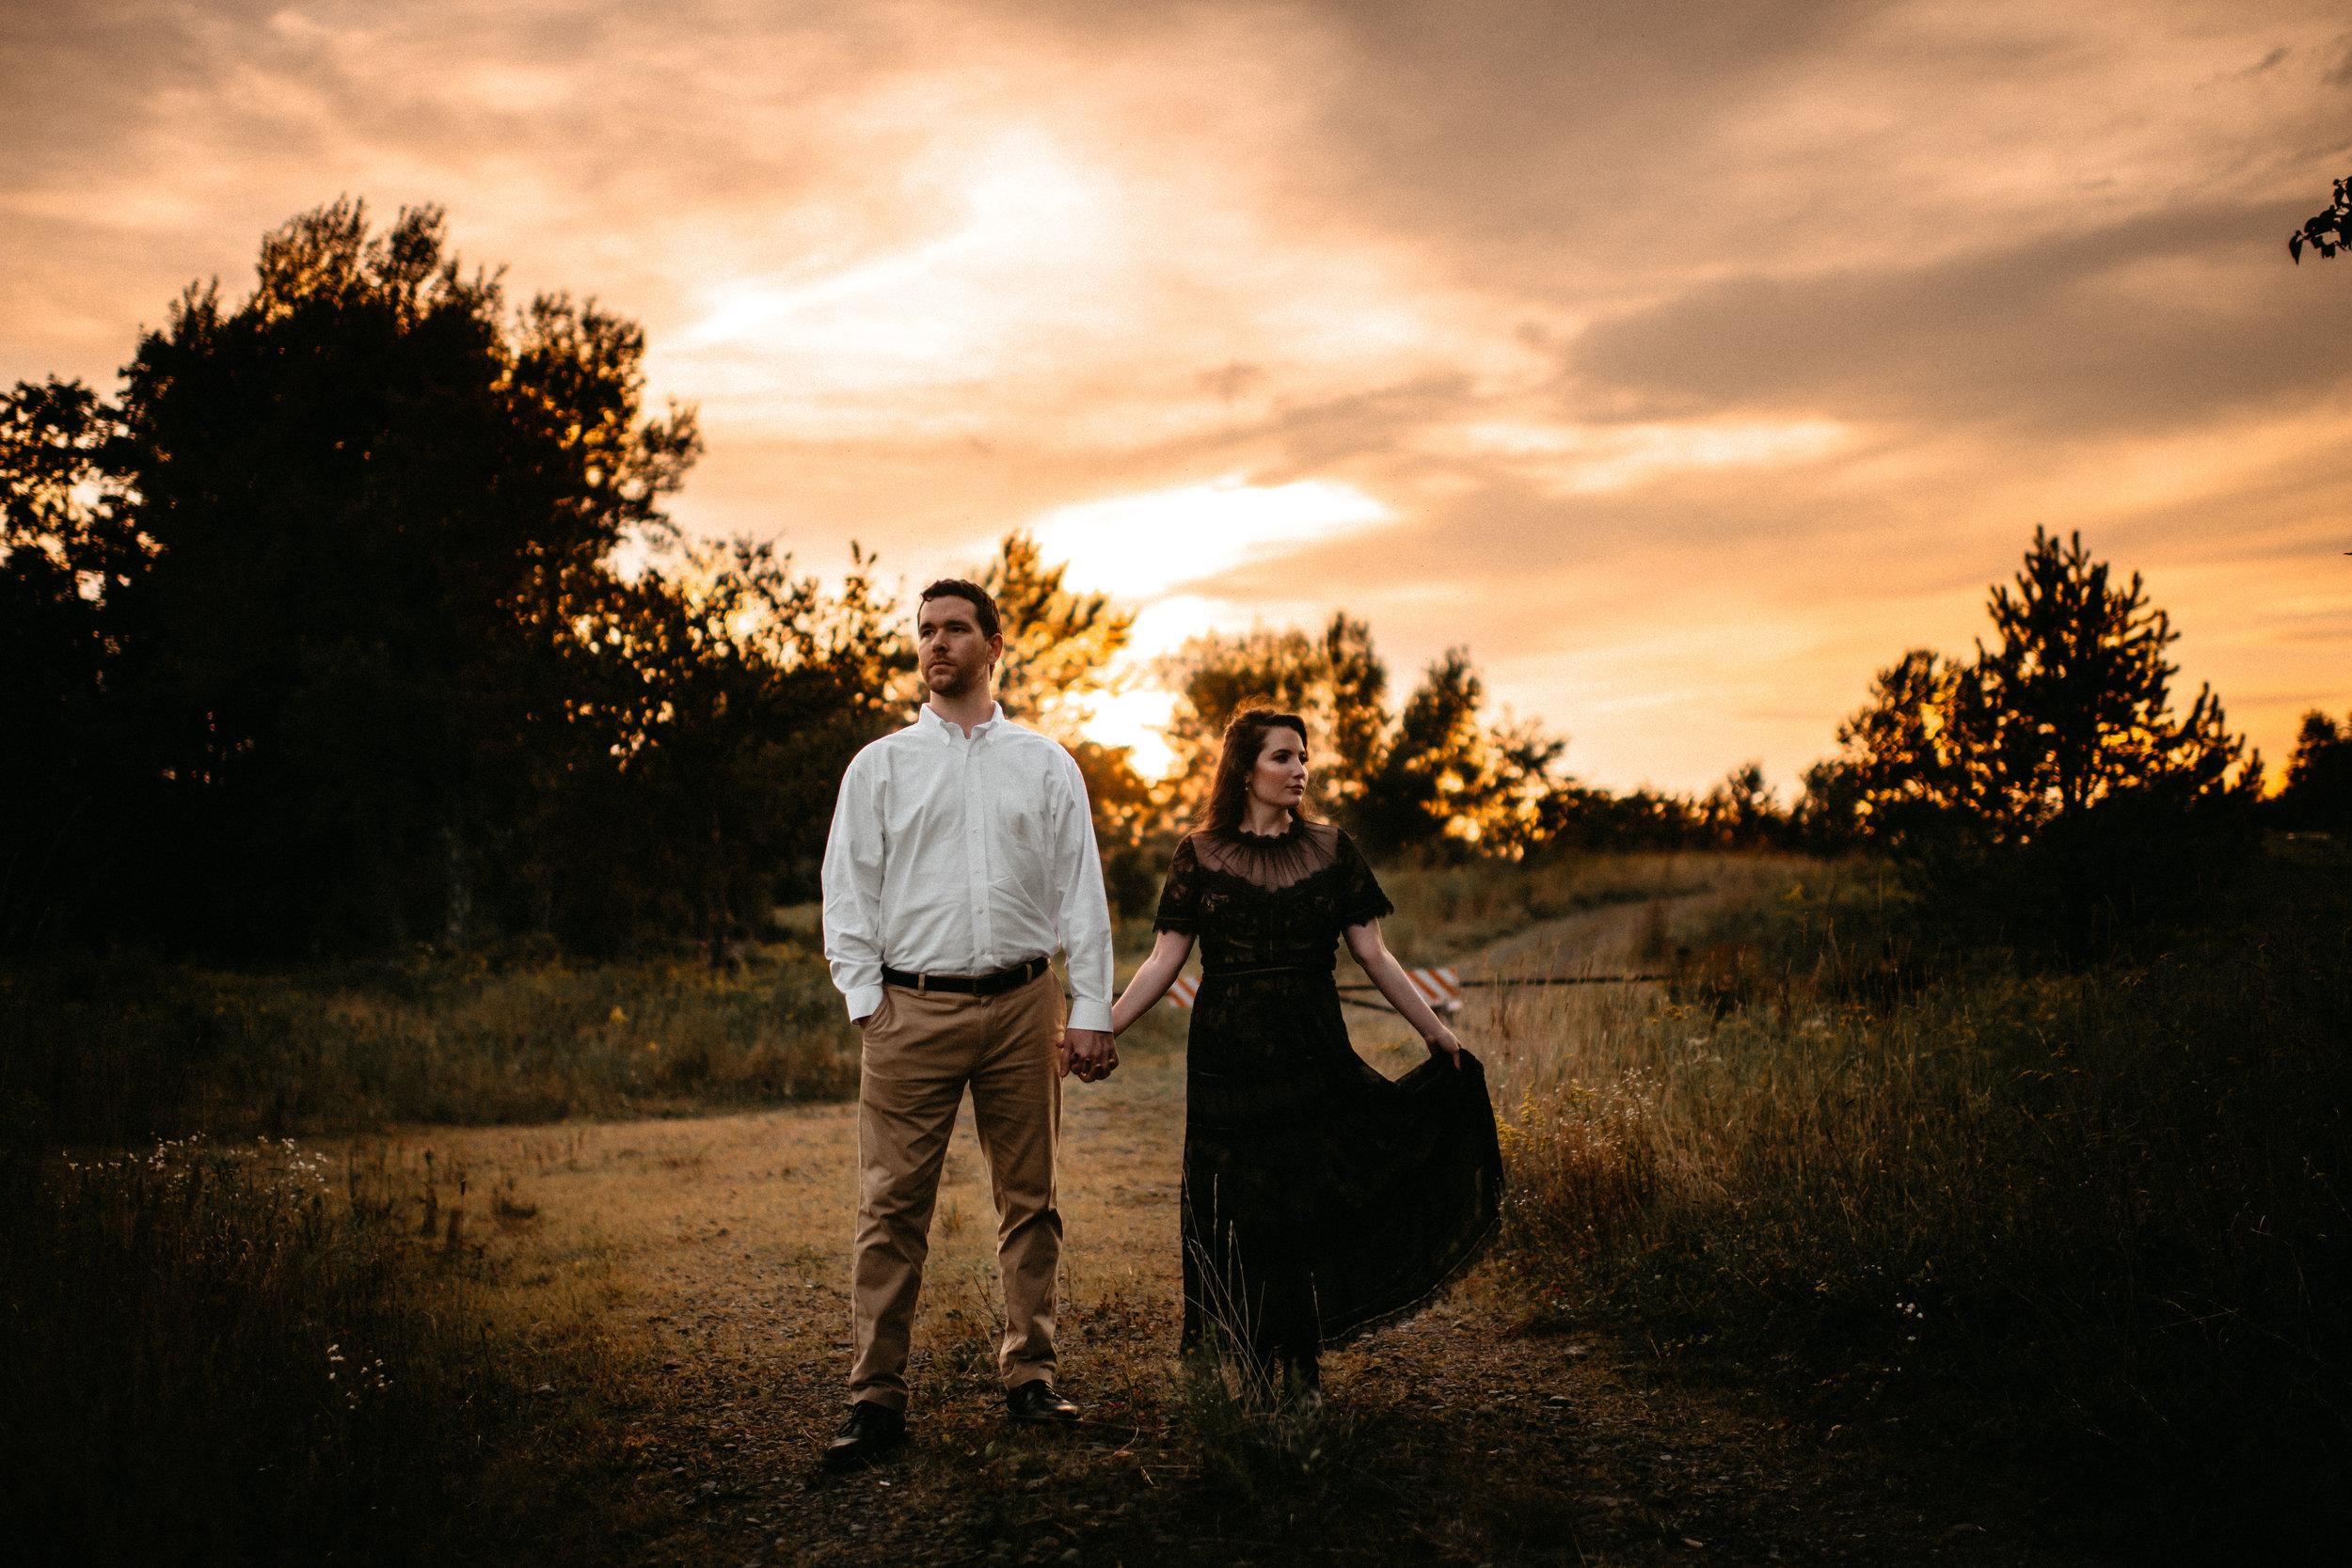 NEPA-Wedding-Engagement-Photographer-at-Ricketts-Glen-State-Park-Benton-PA-109.jpg